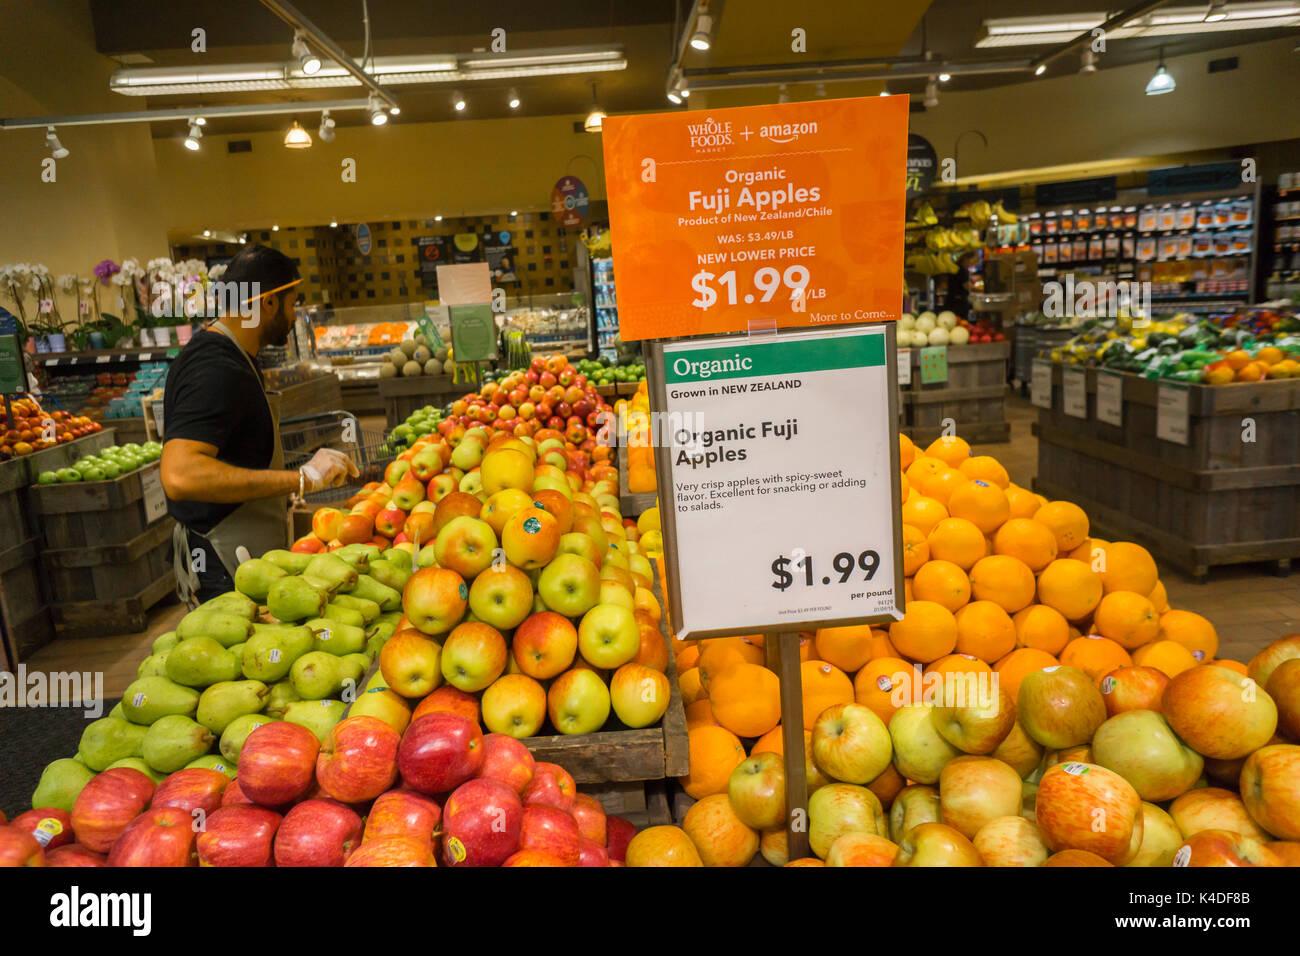 Whole Foods Market Sp